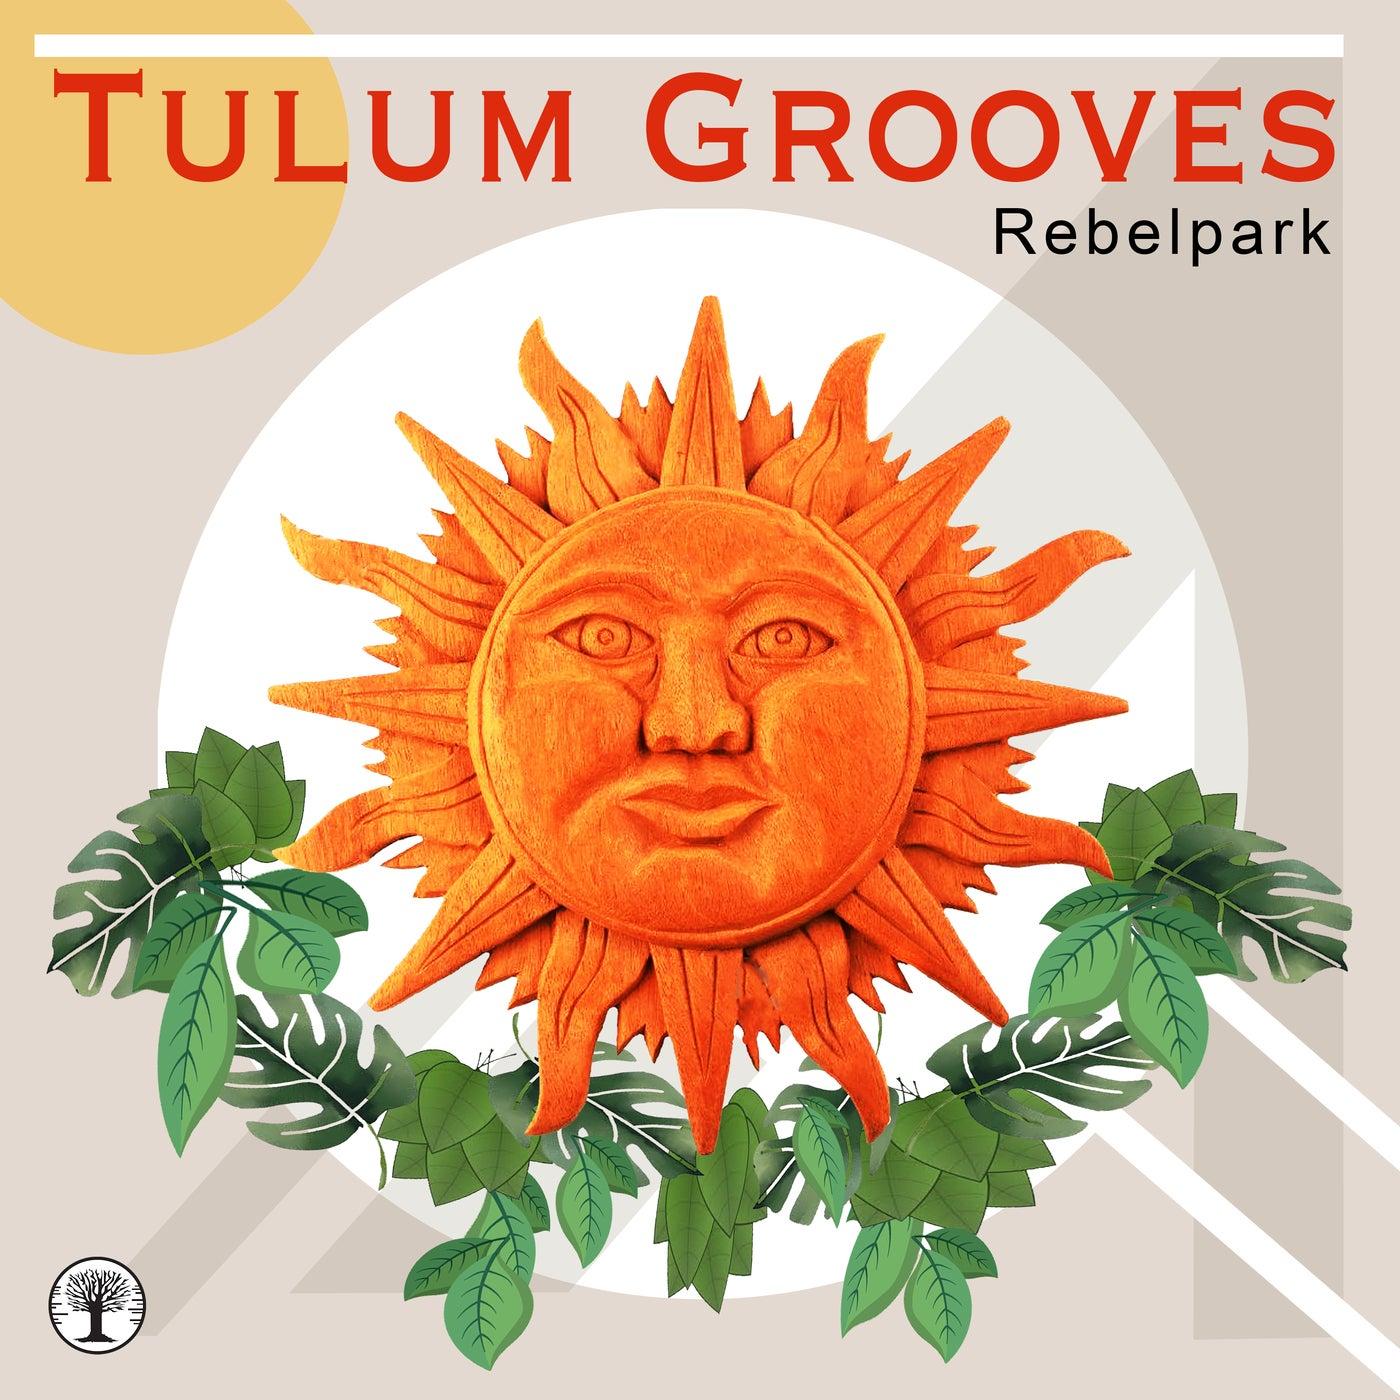 VA - Tulum Grooves [Rebelpark]